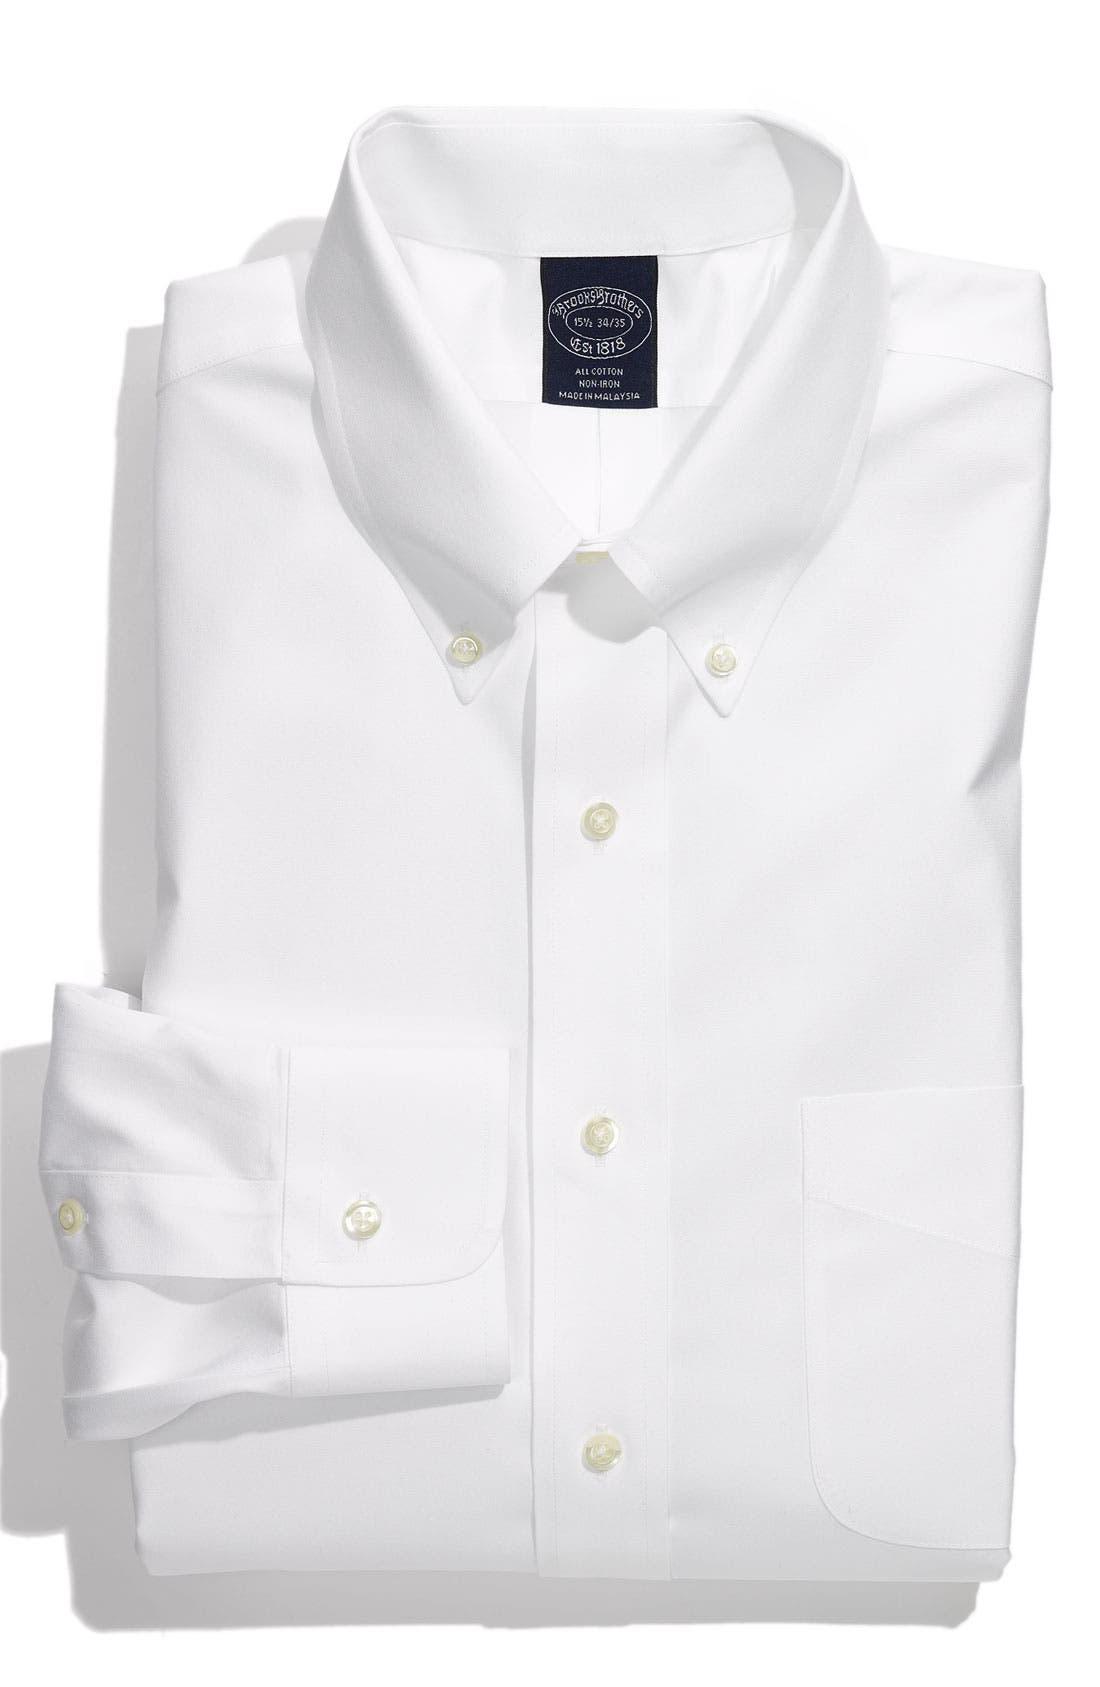 Main Image - Brooks Brothers Non-Iron Dress Shirt